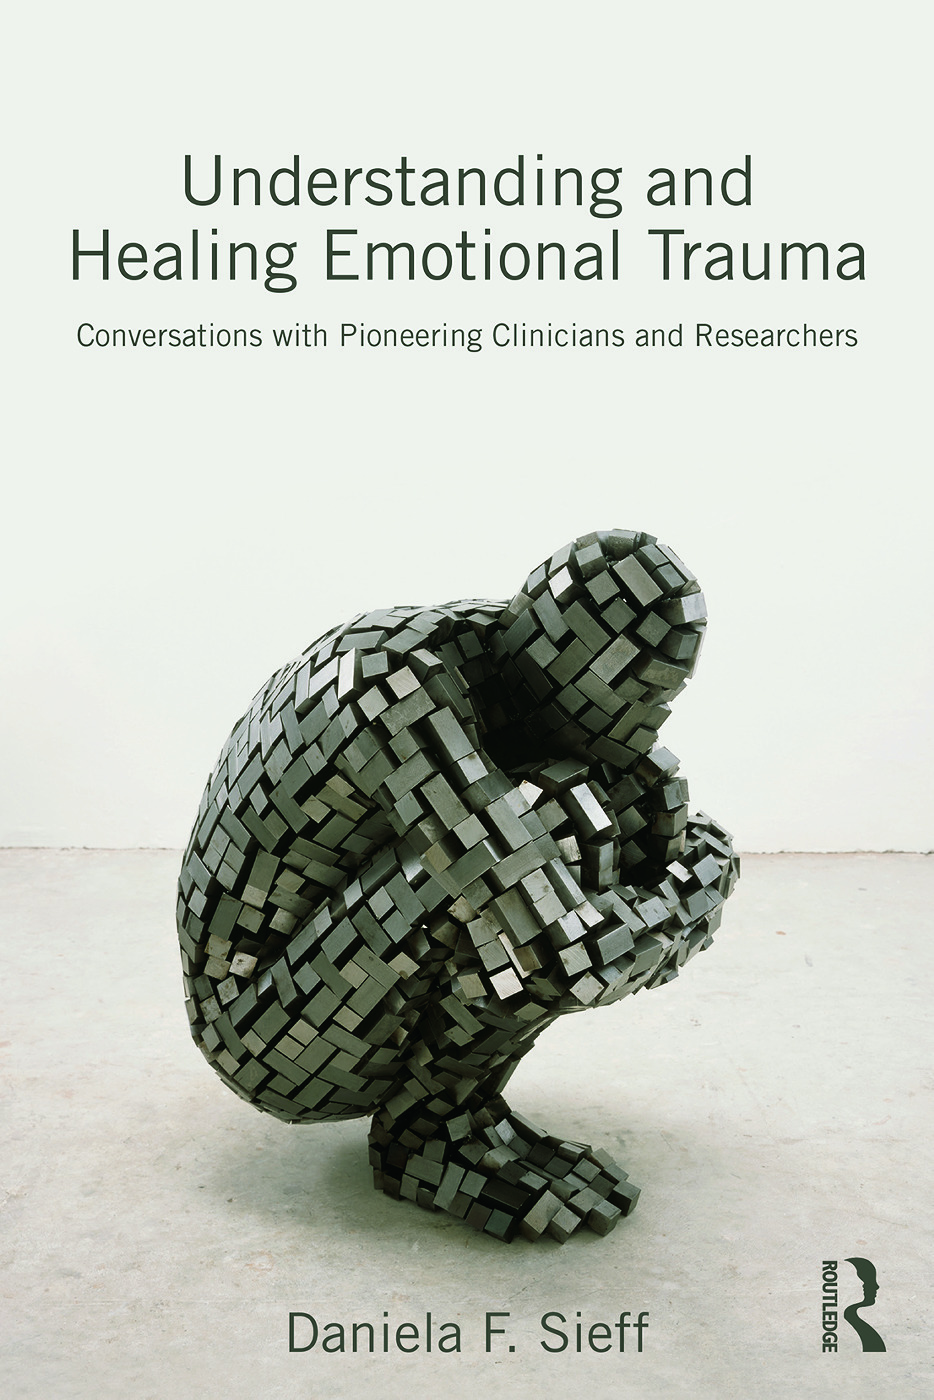 Understanding and Healing Emotional Trauma